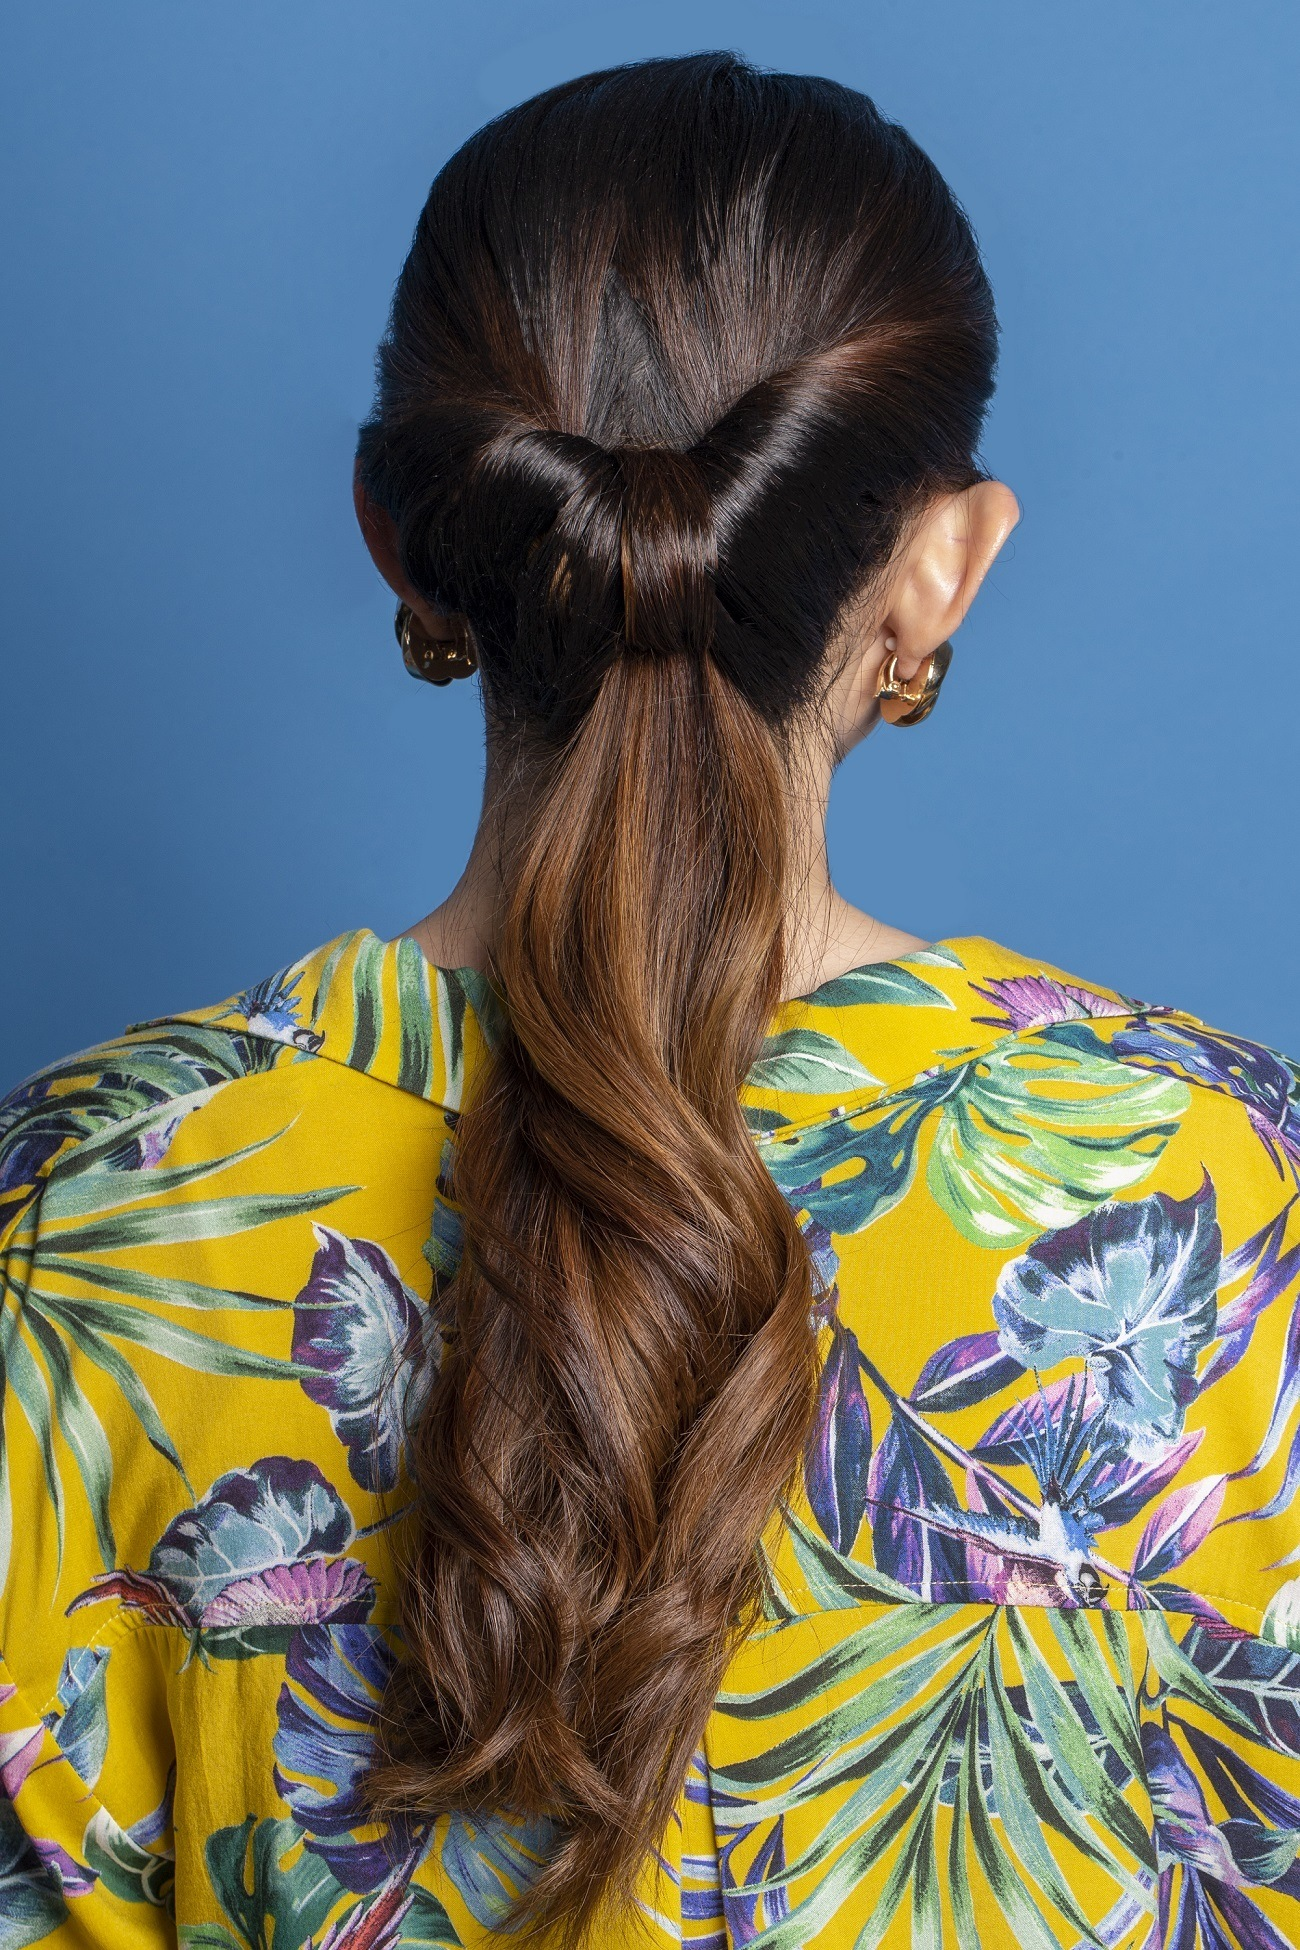 gaya rambut looped in ponytail